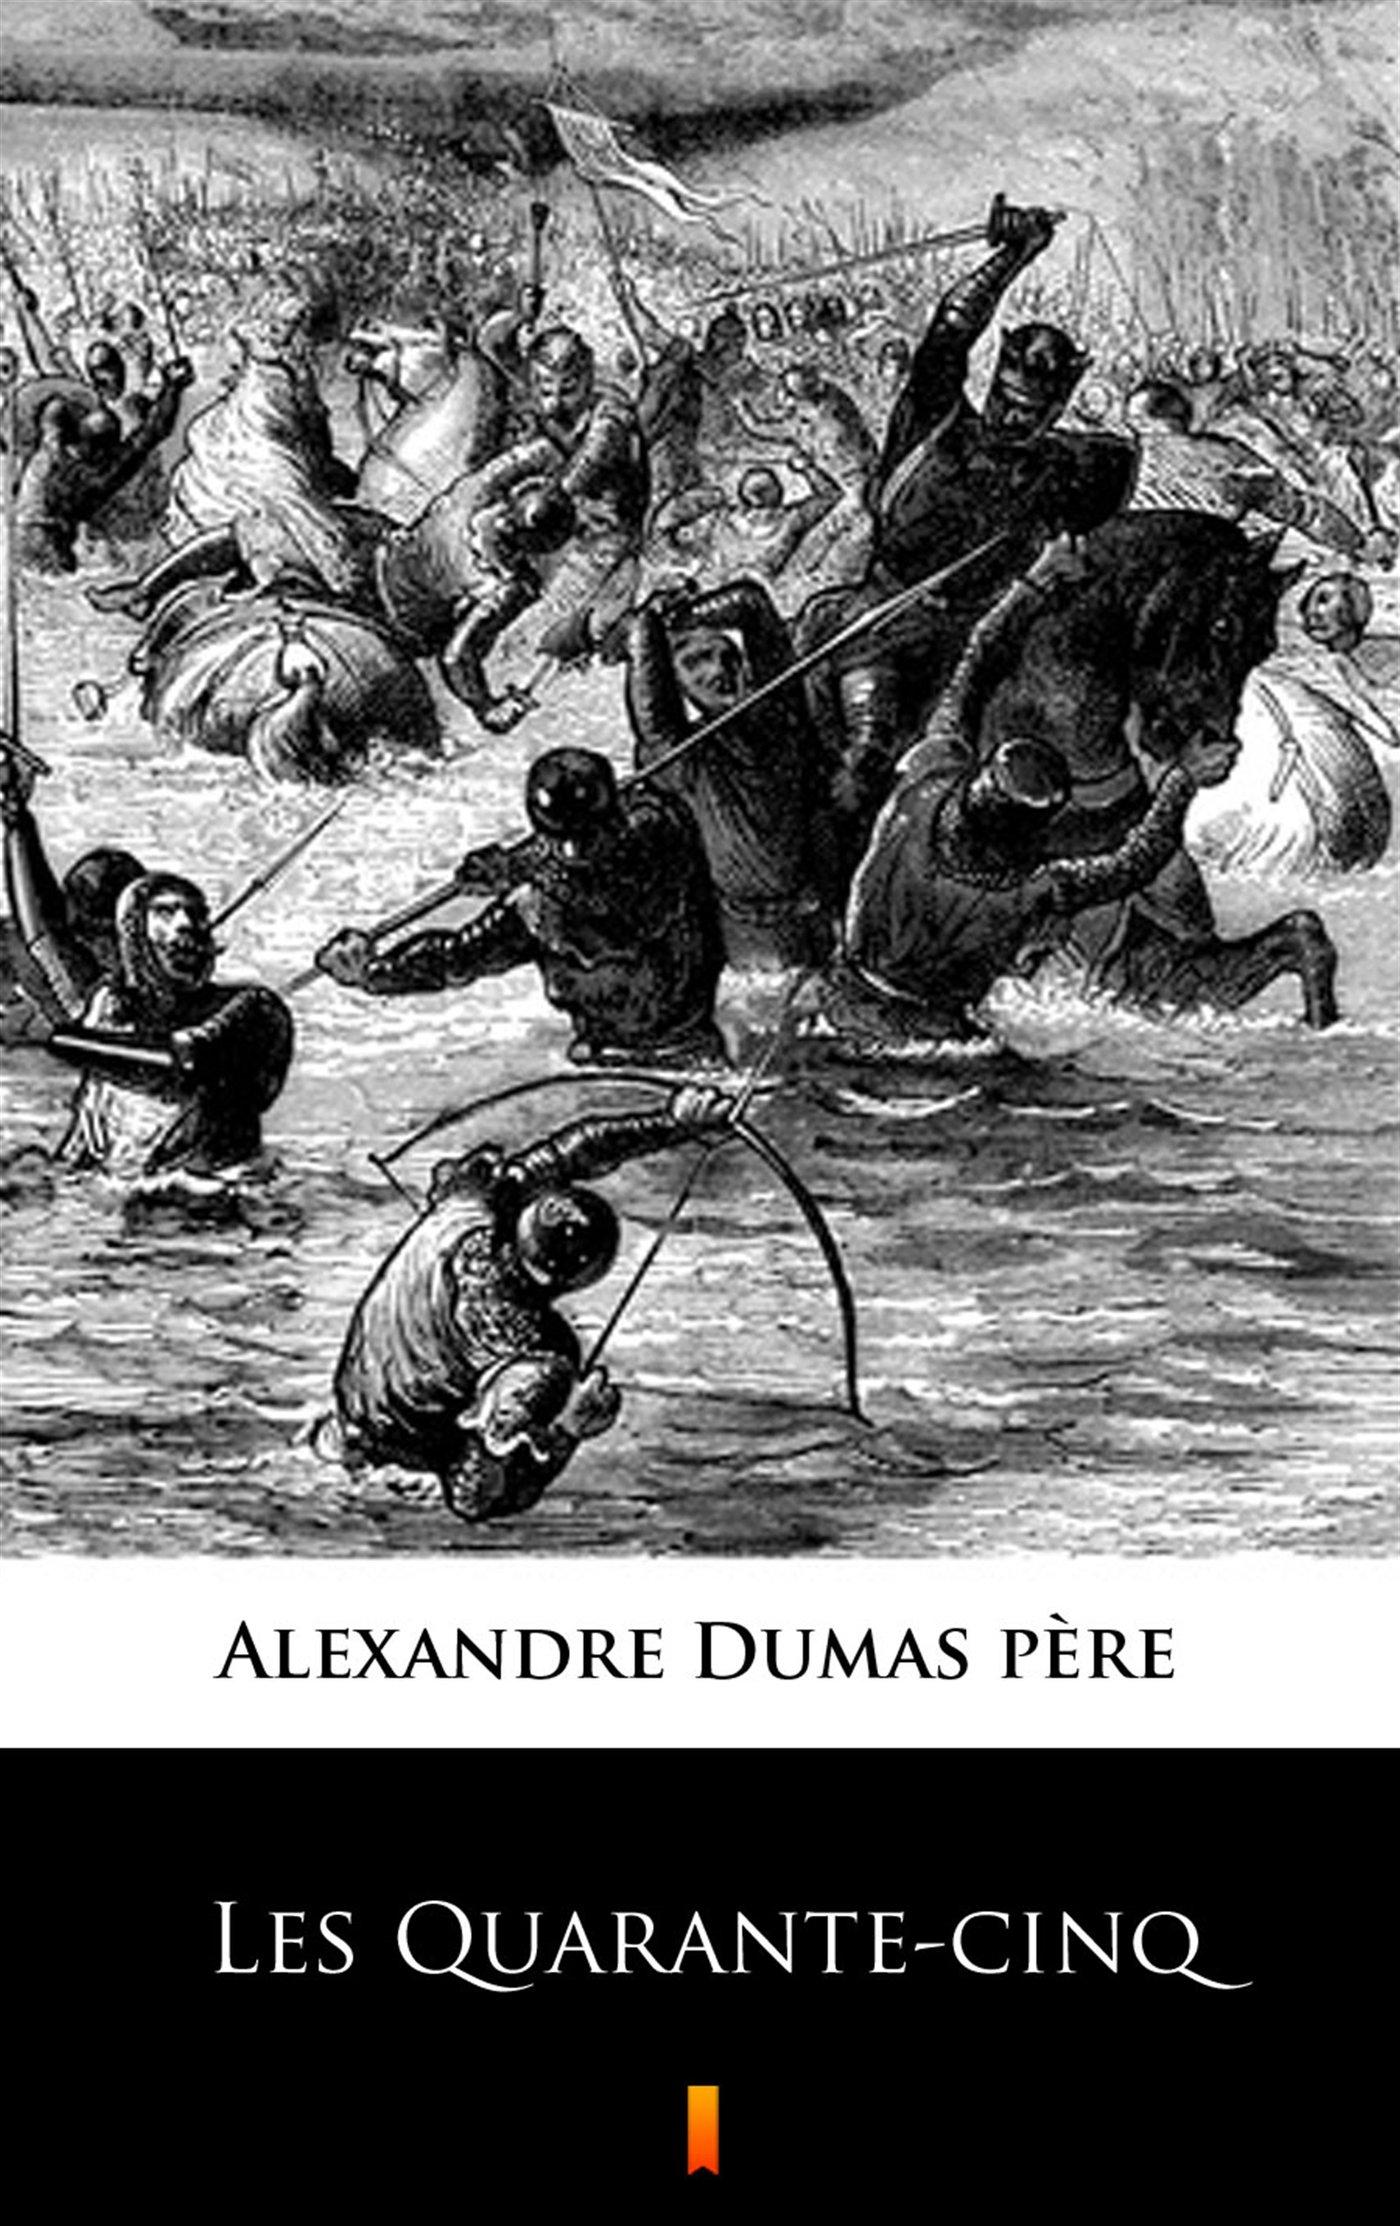 Les Quarante-cinq - Ebook (Książka EPUB) do pobrania w formacie EPUB